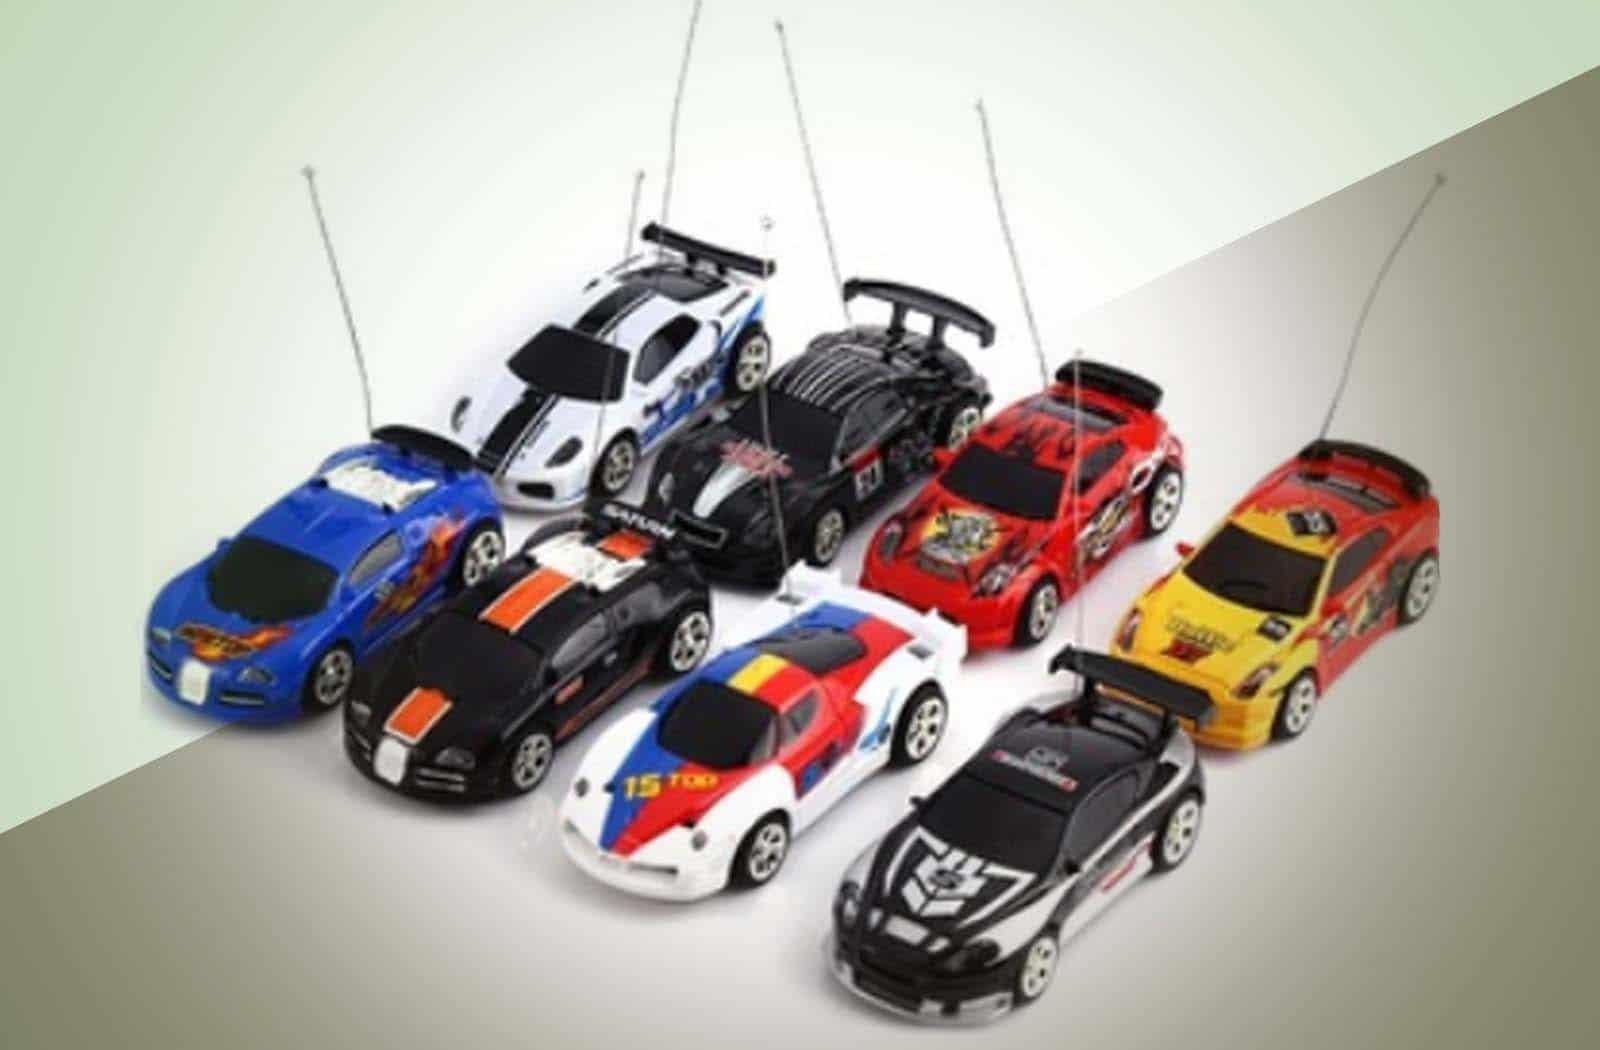 Top 5 Best Mini RC Car 2020 review